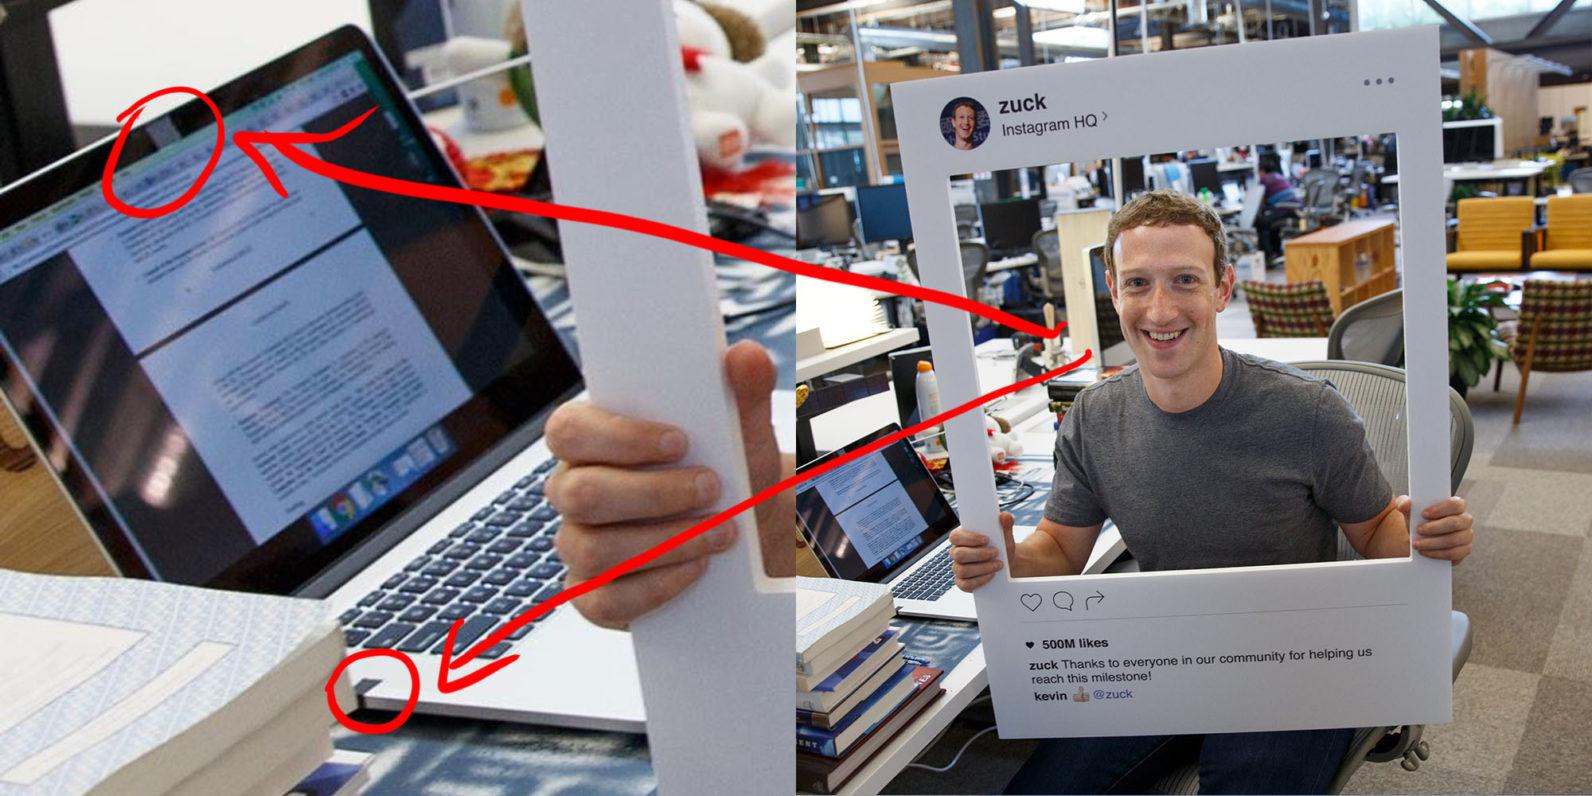 Mark-Zuckerberg-Tape-Facebook-Instagram-1-1592x796